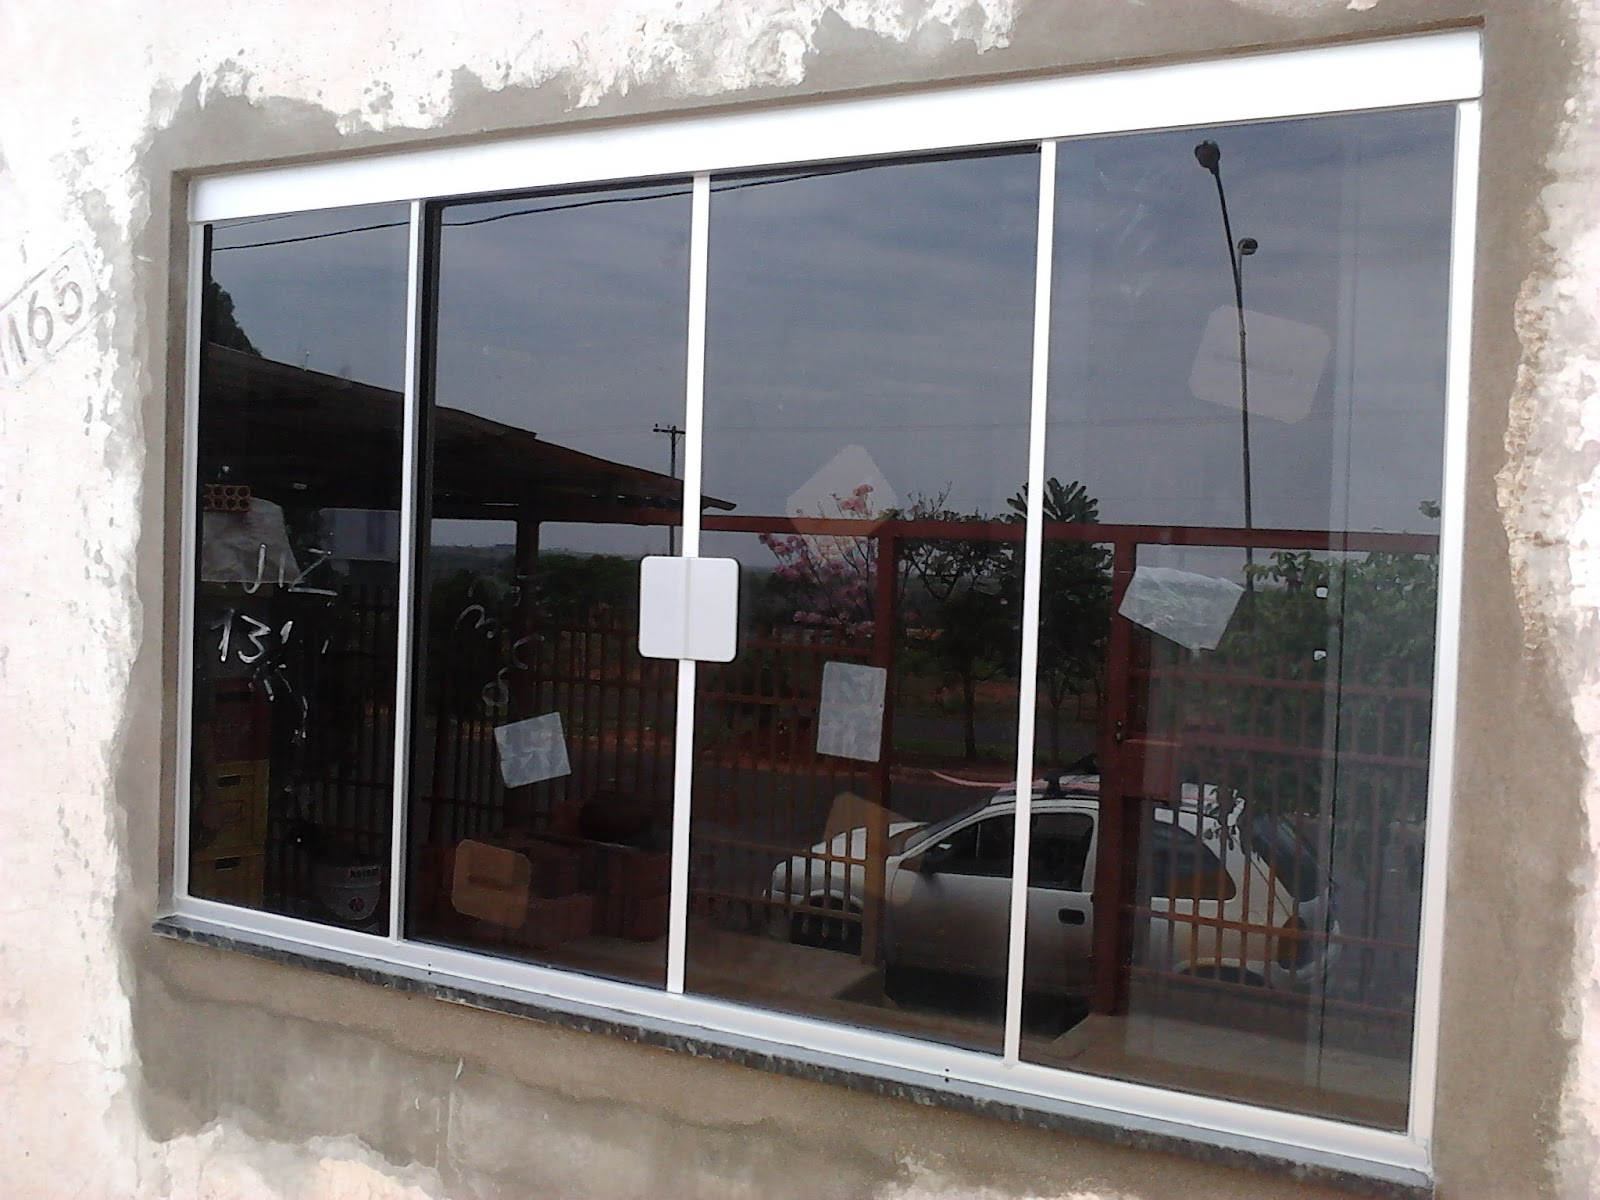 #695C4F FRANCO VIDROS TEMPERADOS: Outubro 2012 10 Janelas De Vidro Com Aluminio Fosco